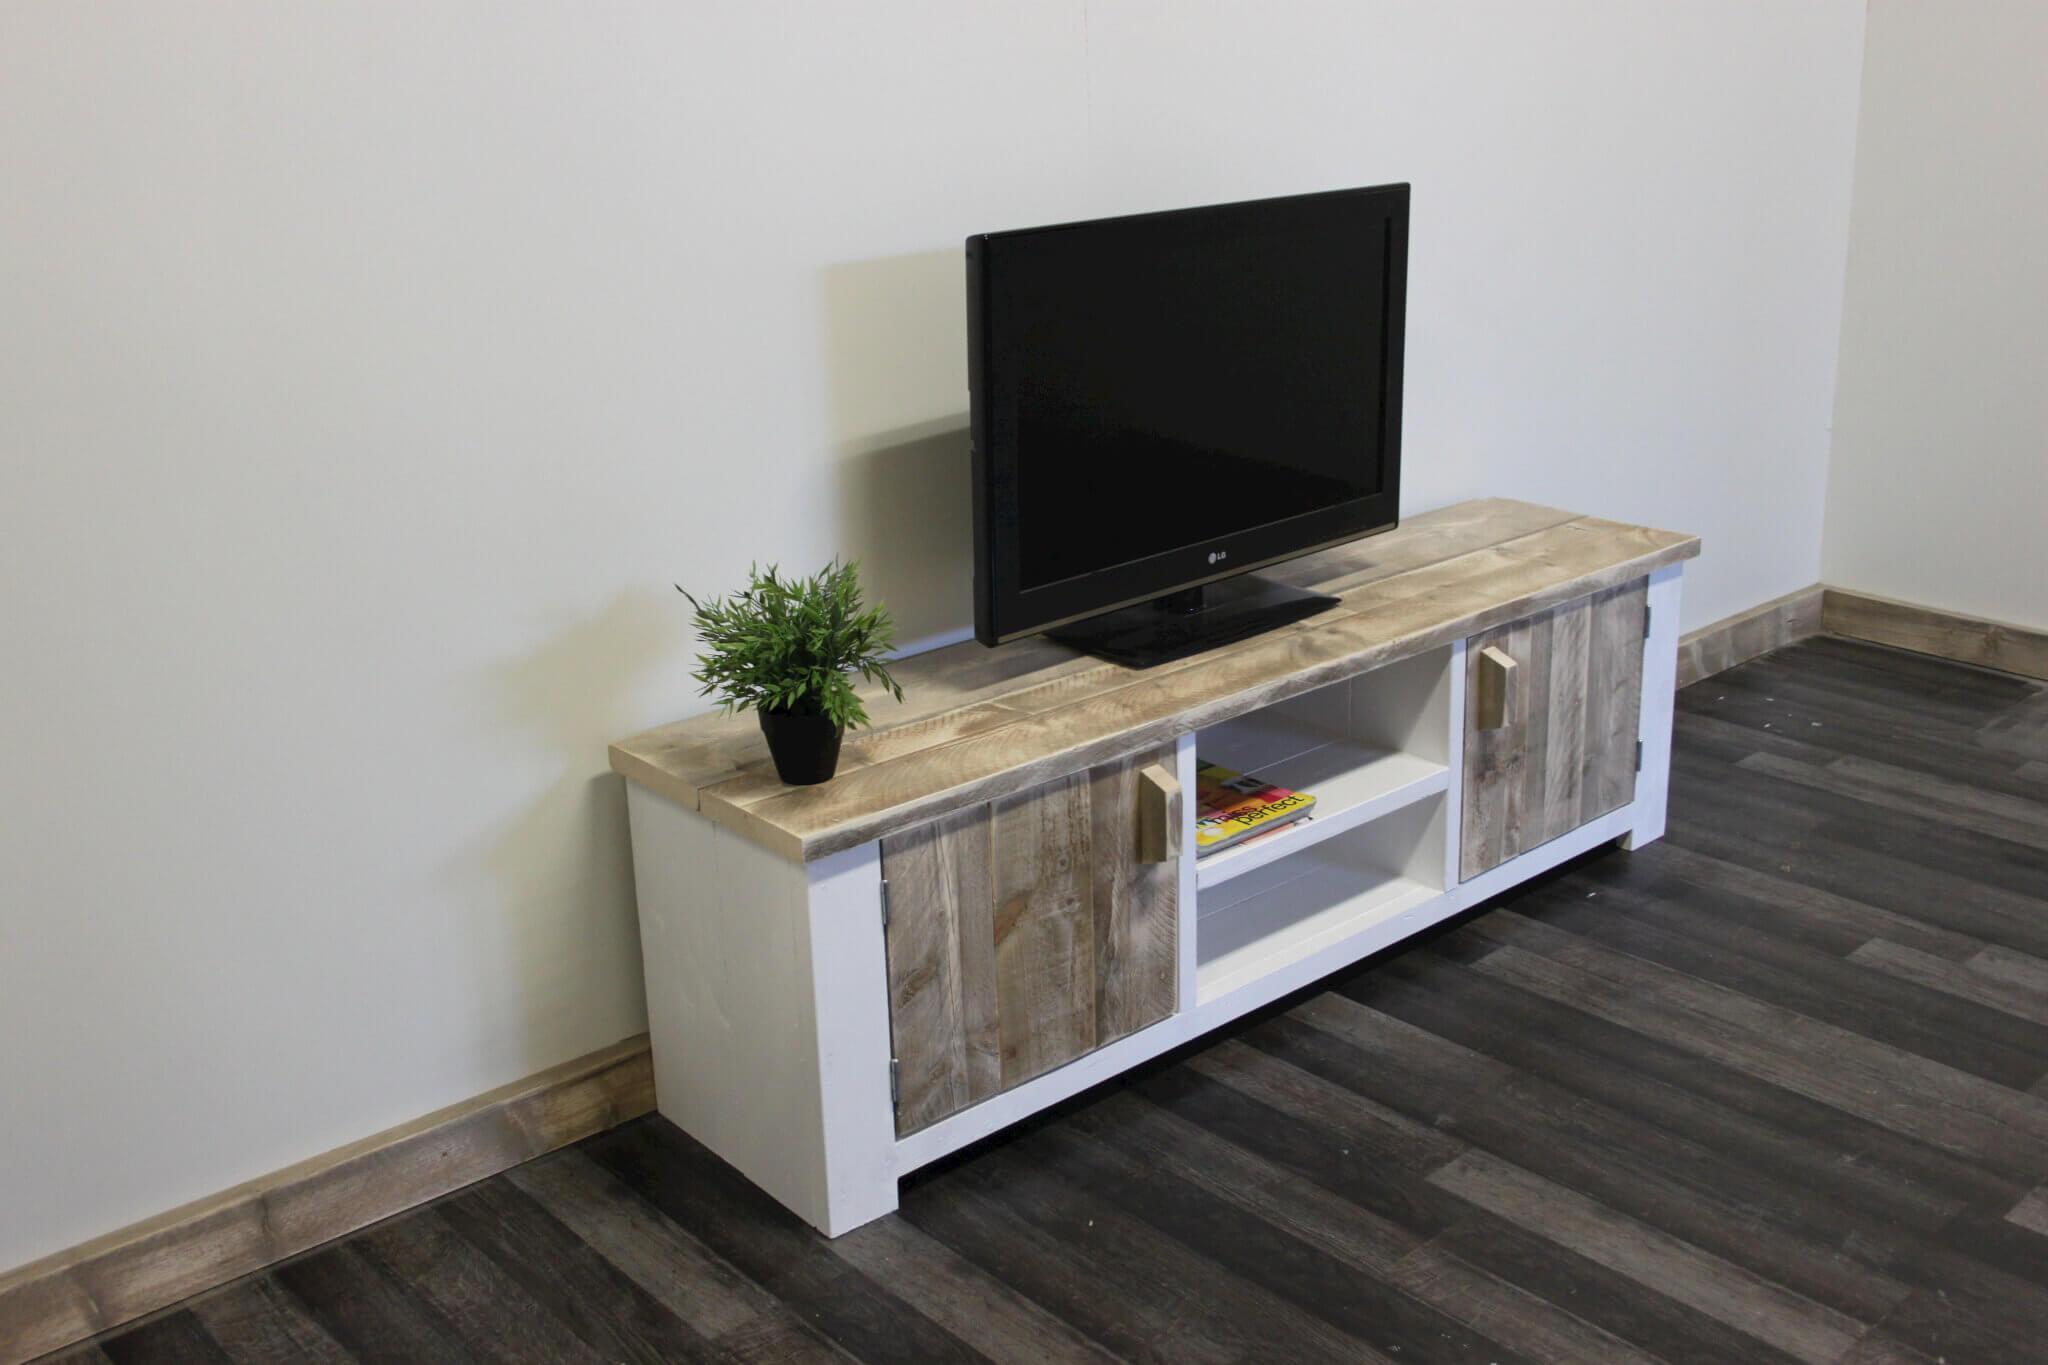 Steigerhouten tv meubel cheney steigerhouttrend for Steigerhout tv meubel maken